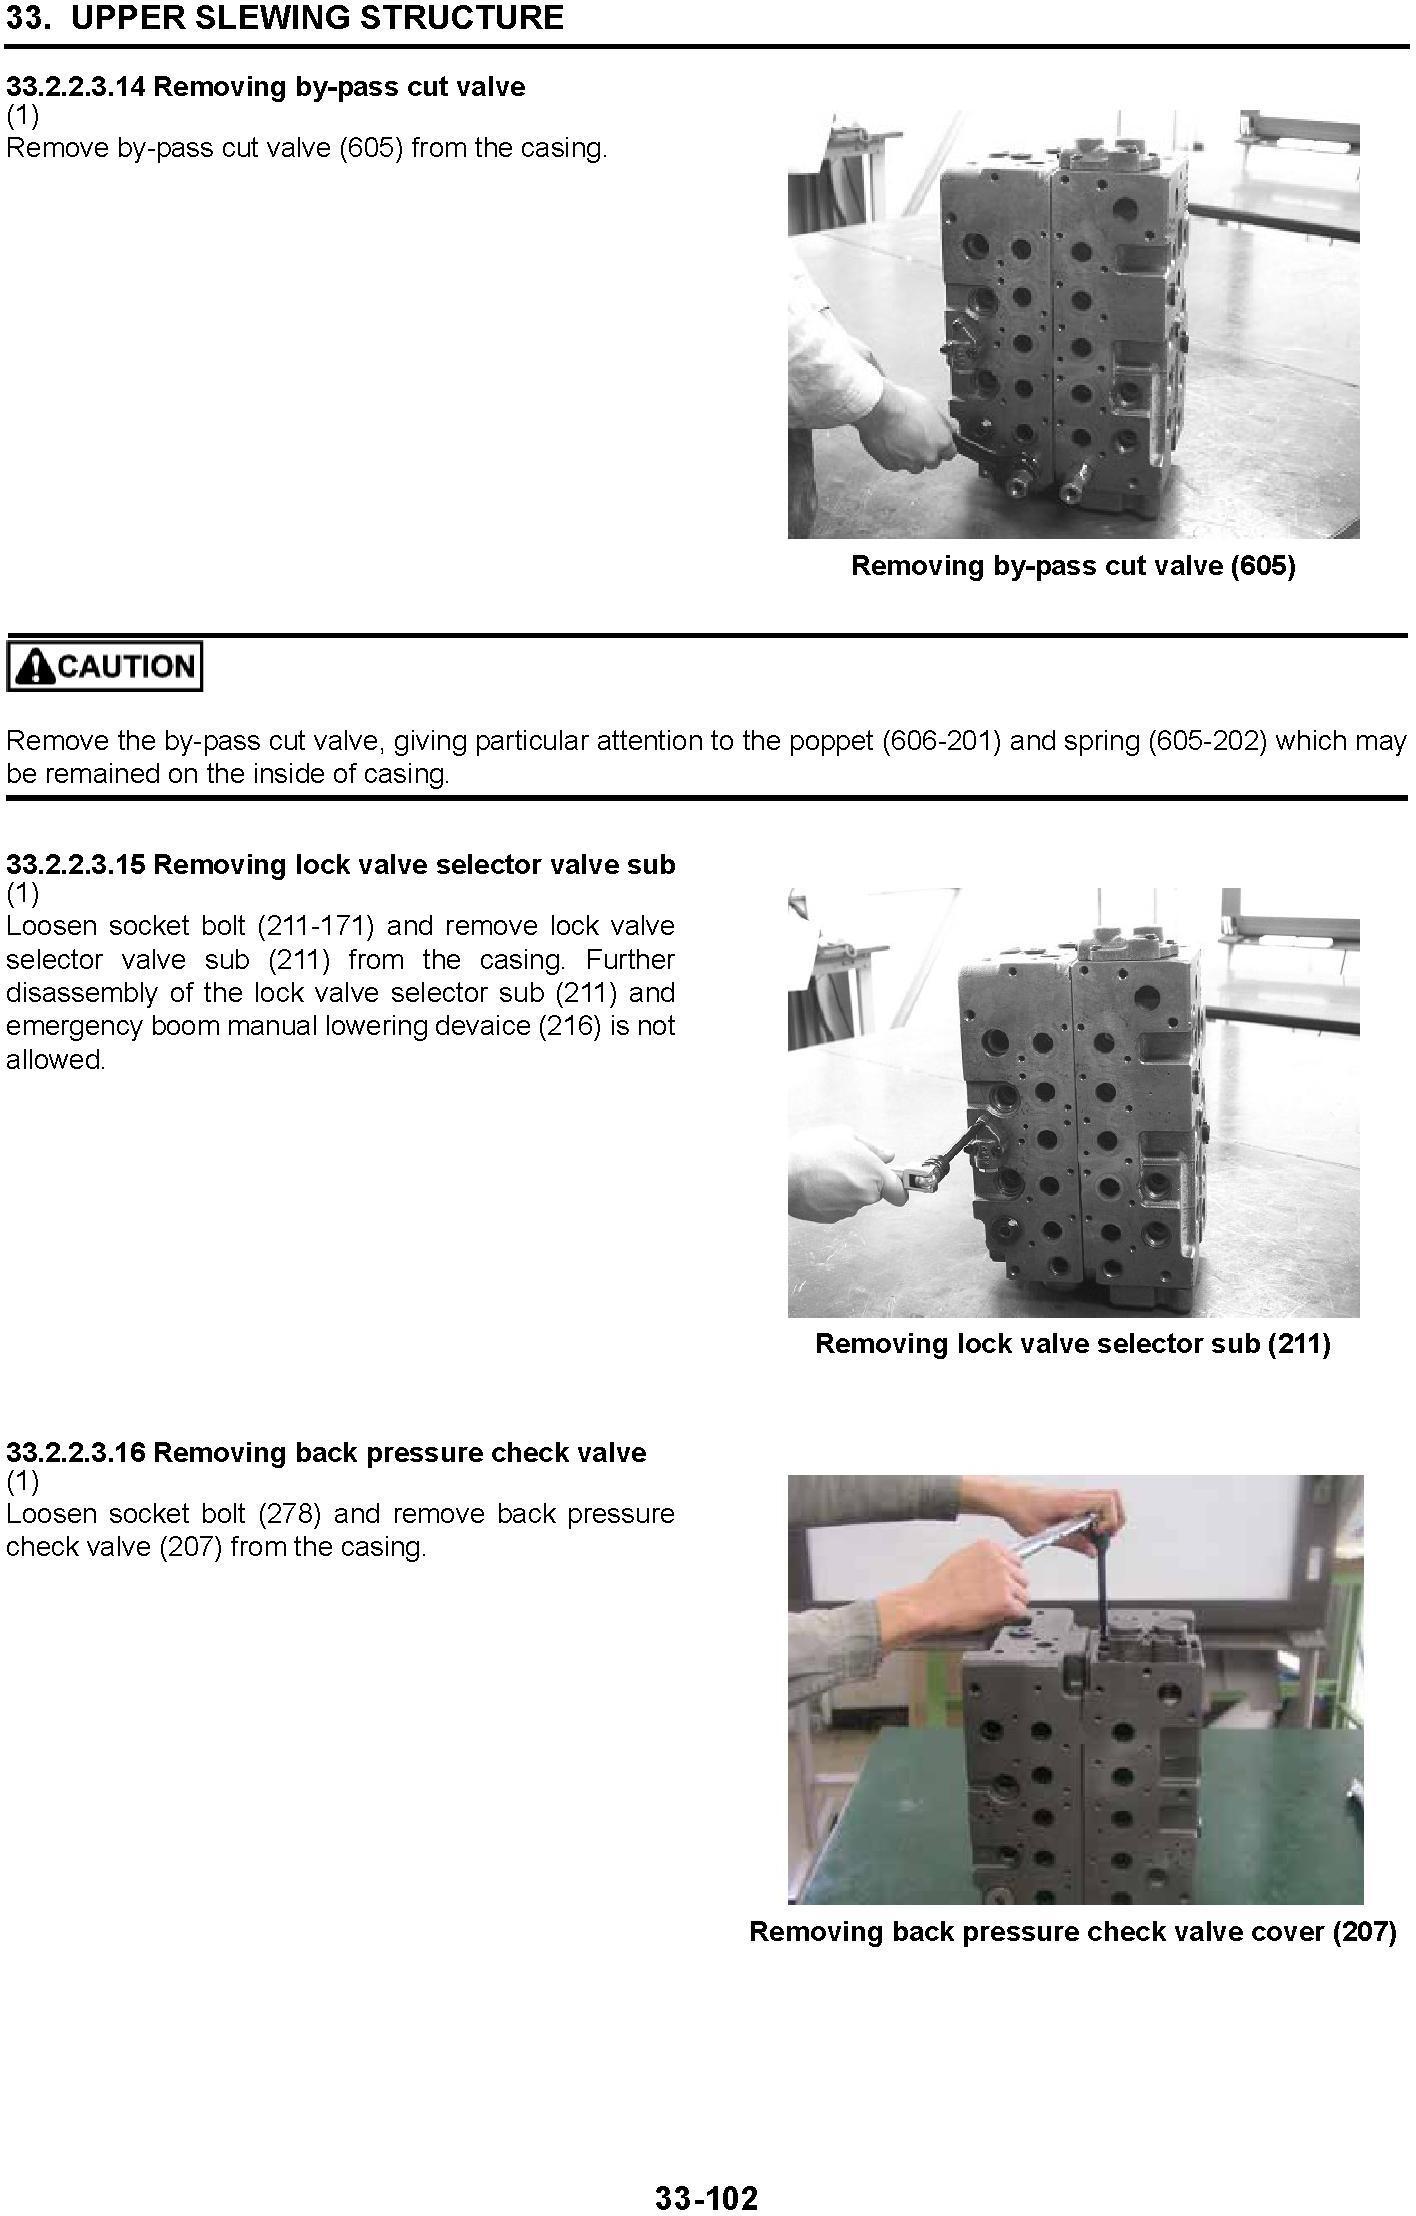 New Holland E140CSR Crawler Excavator Service Manual - 2